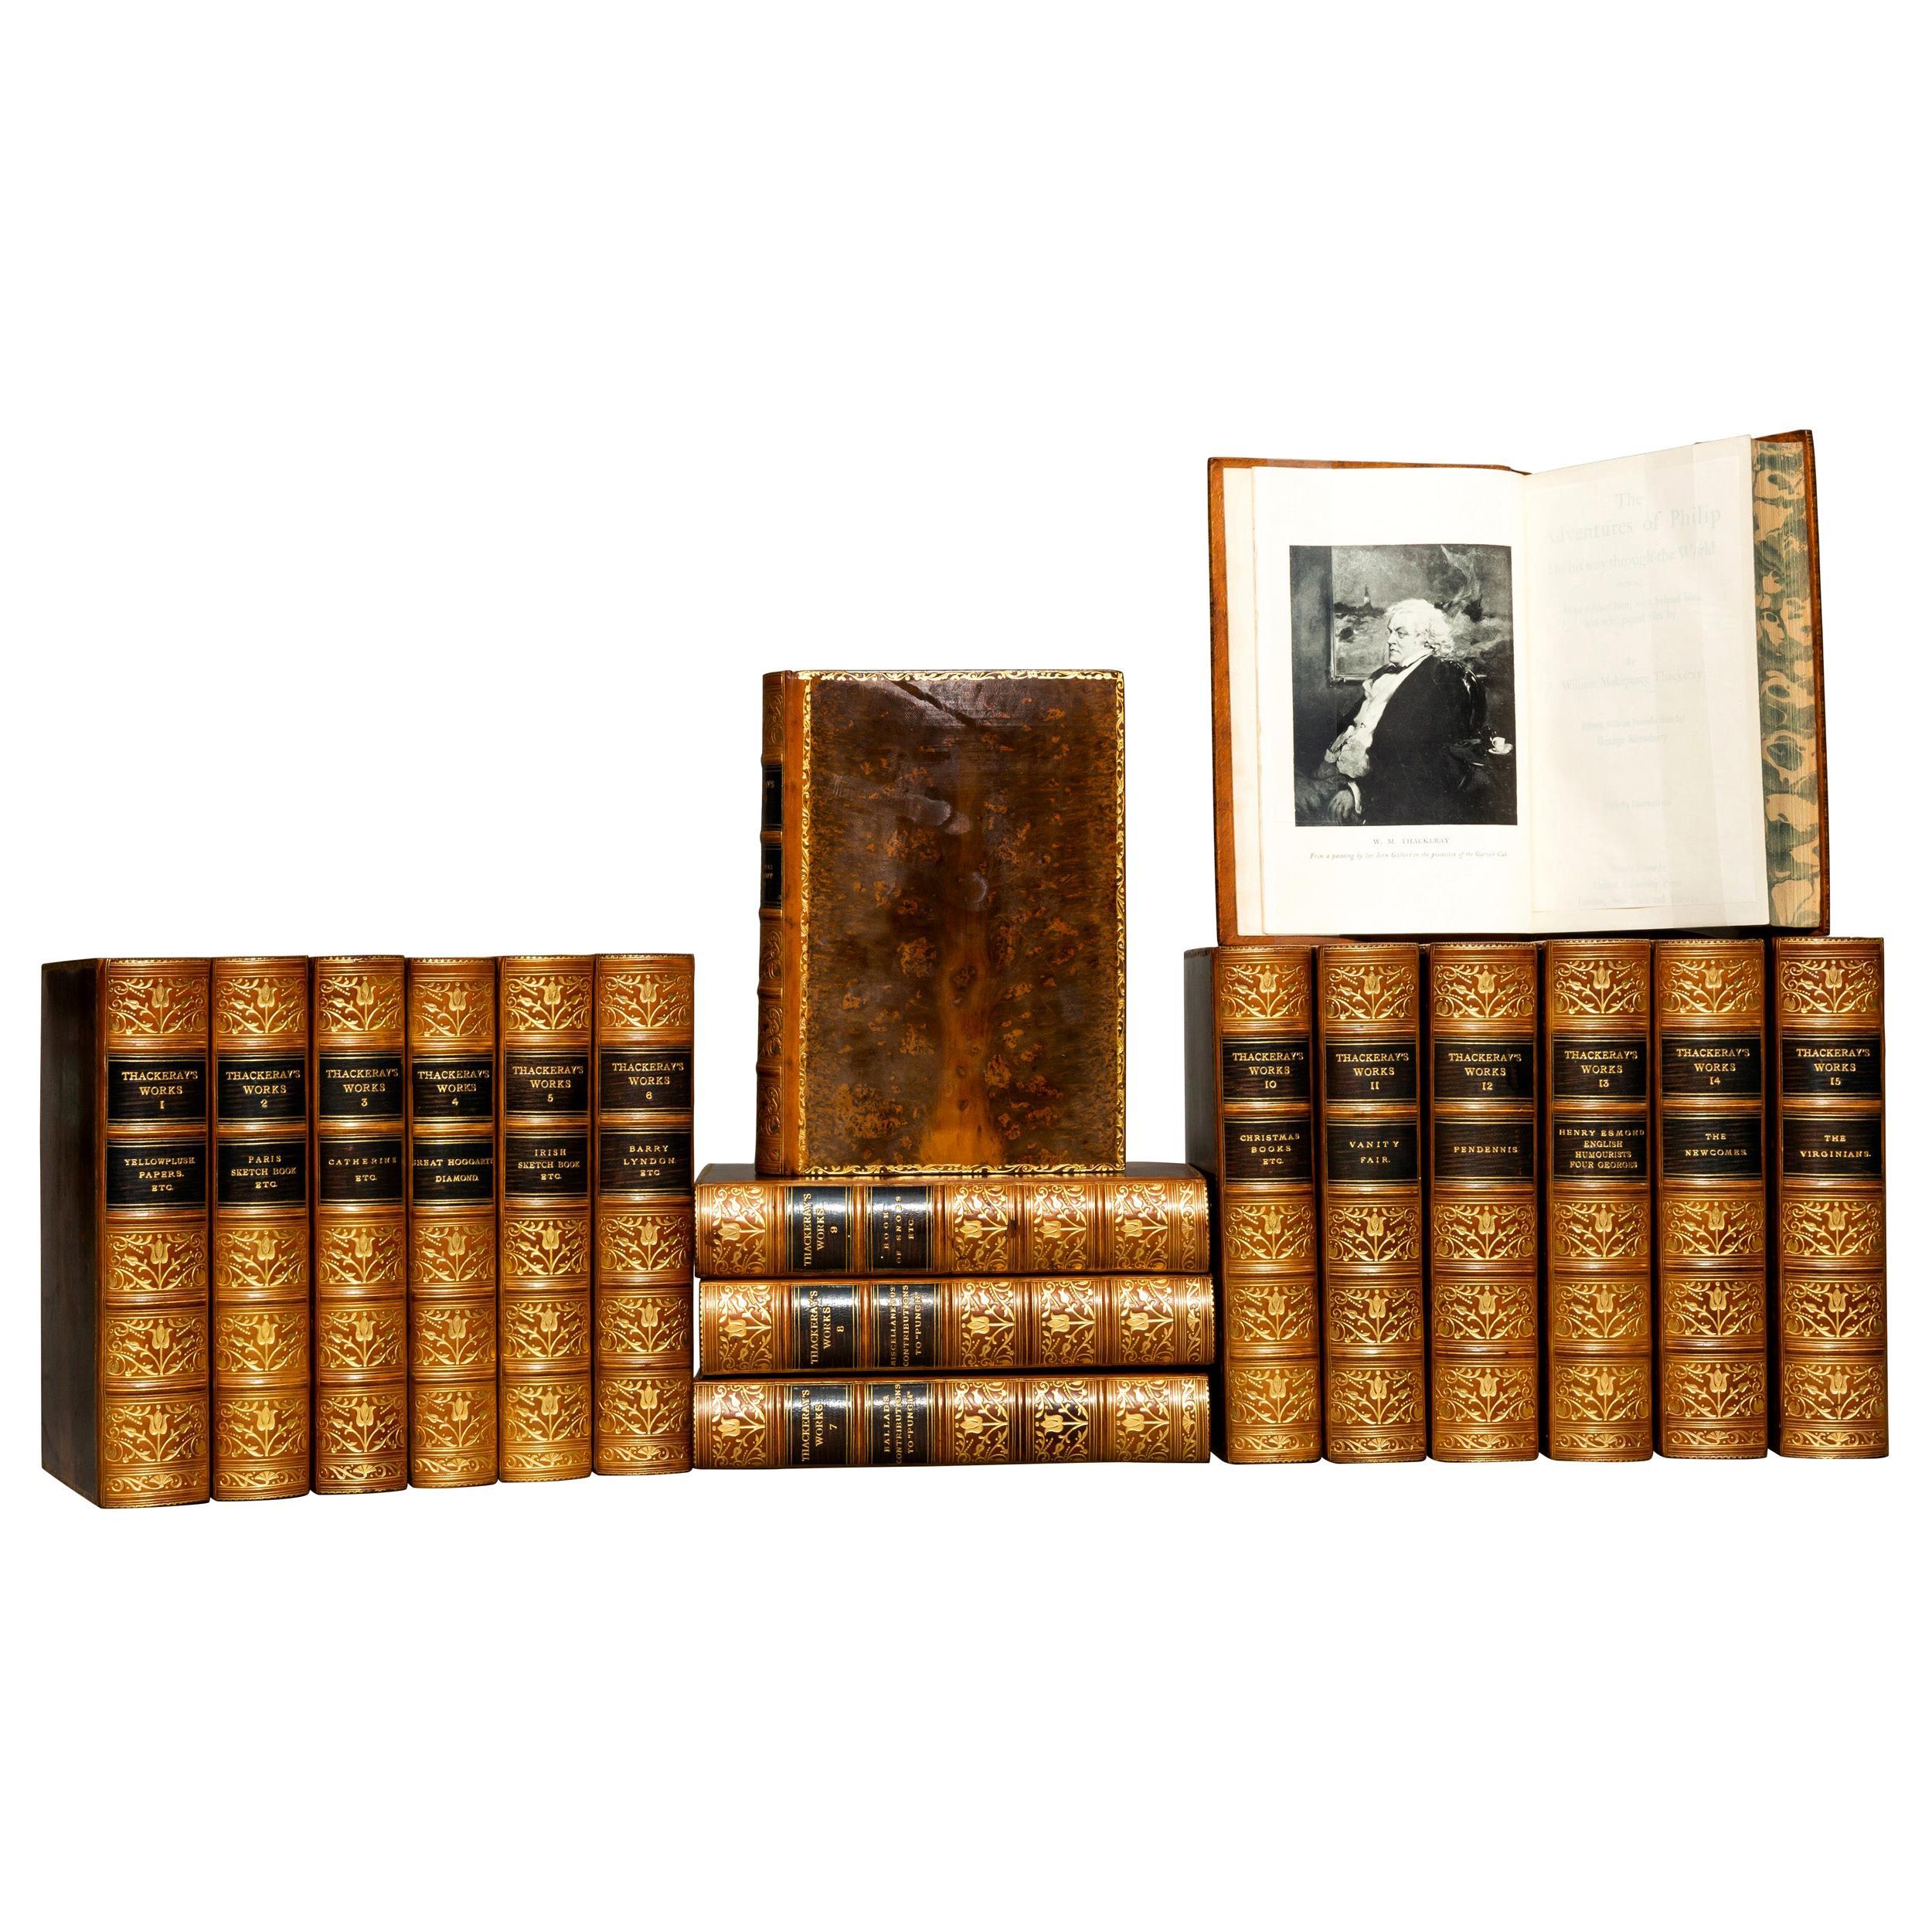 William Thackeray, Complete Works